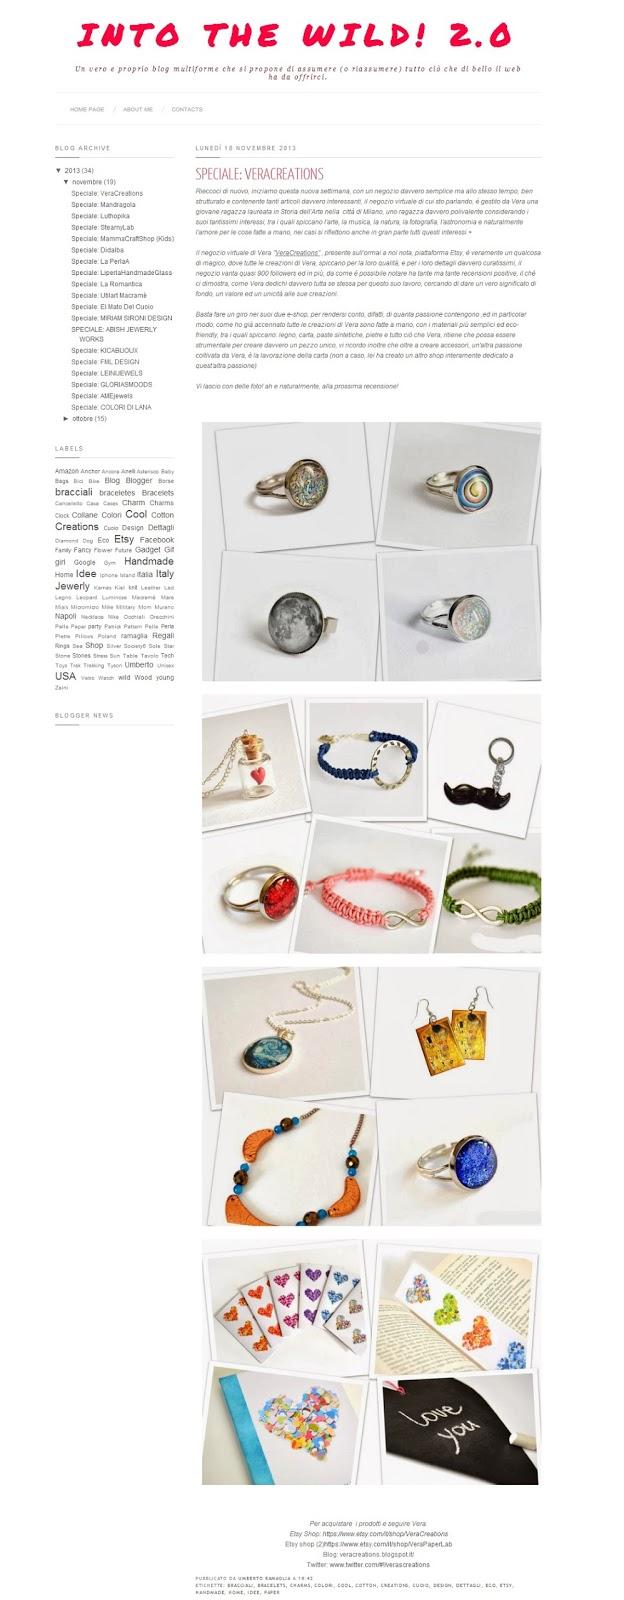 http://ilsognodiunavita.blogspot.it/2013/11/speciale-veracreations.html